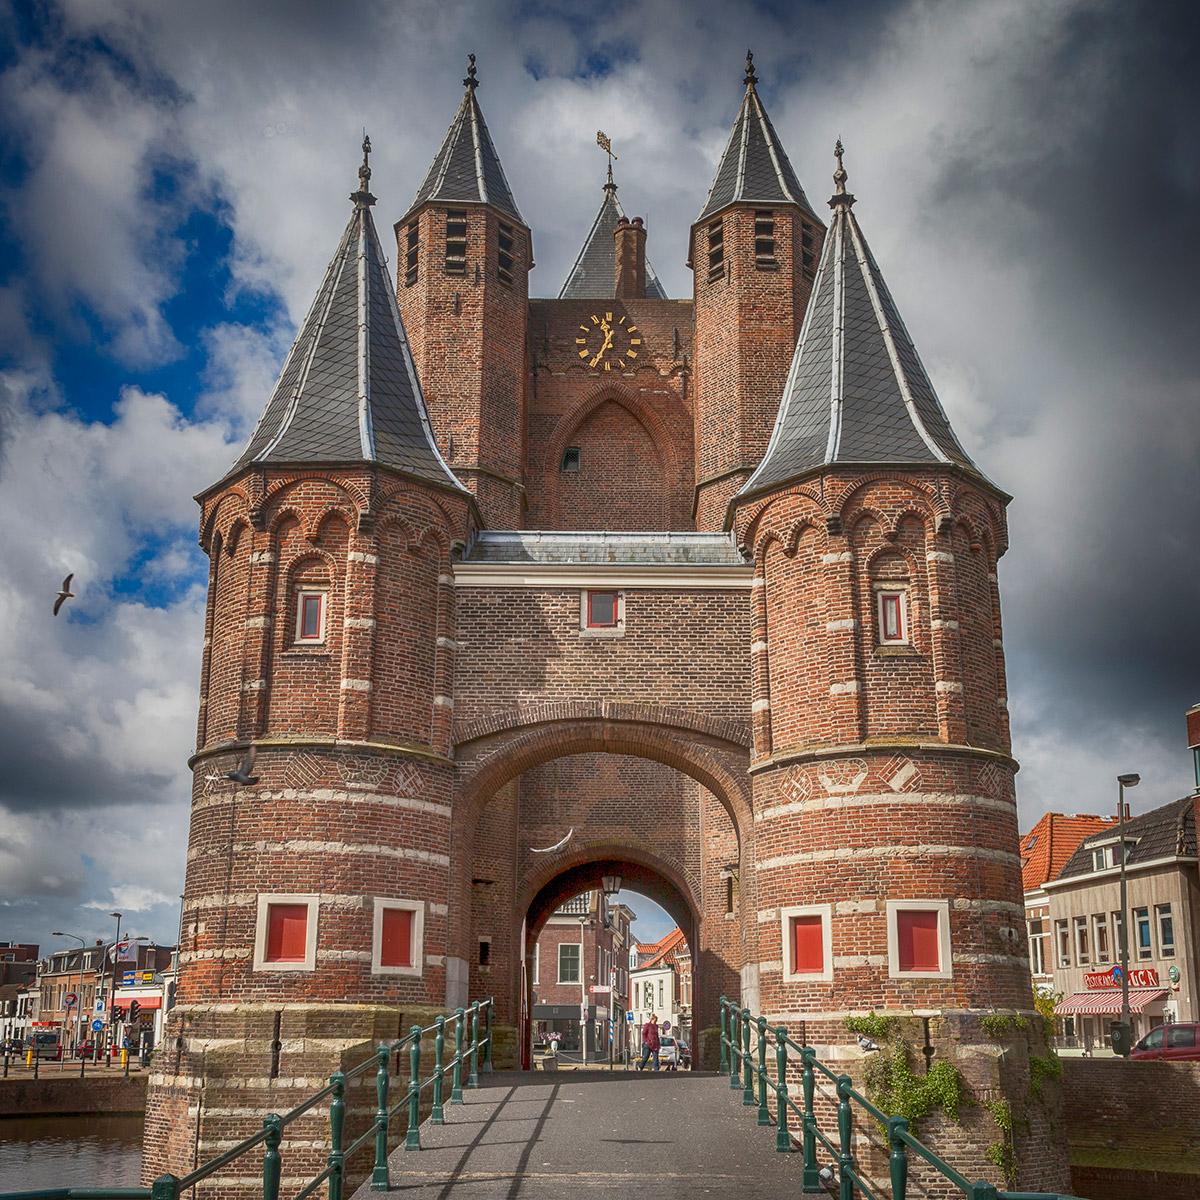 workshop fotografie fotocursus Haarlem individueel prive groep cursus